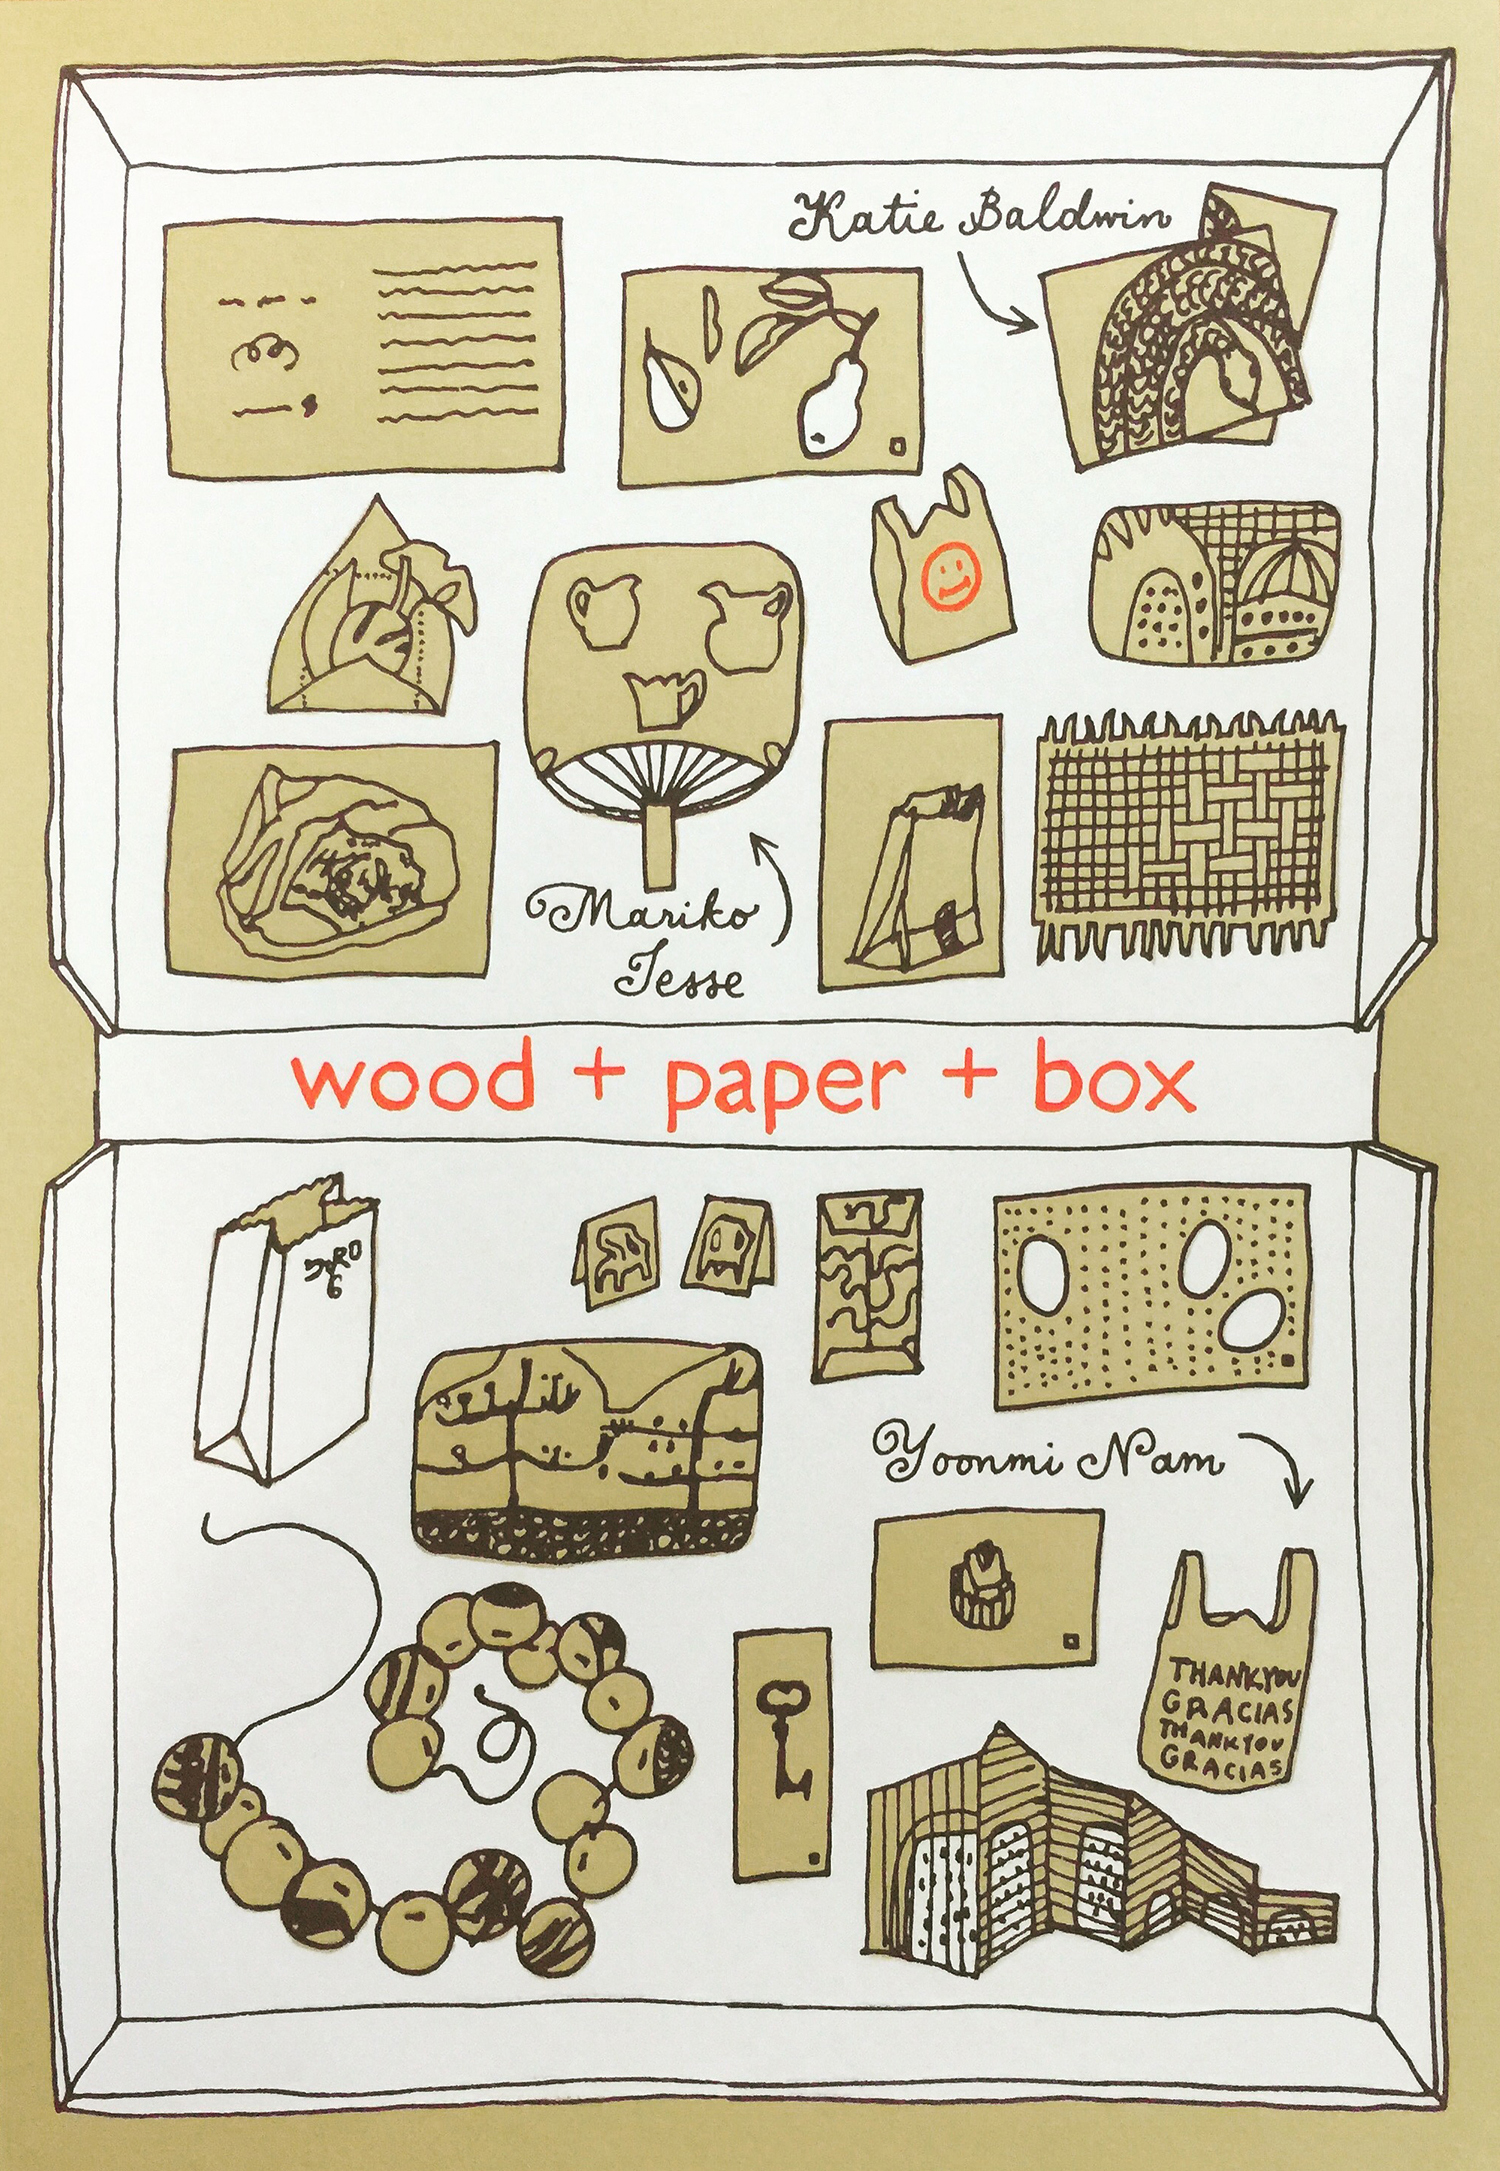 wood + paper + box poster